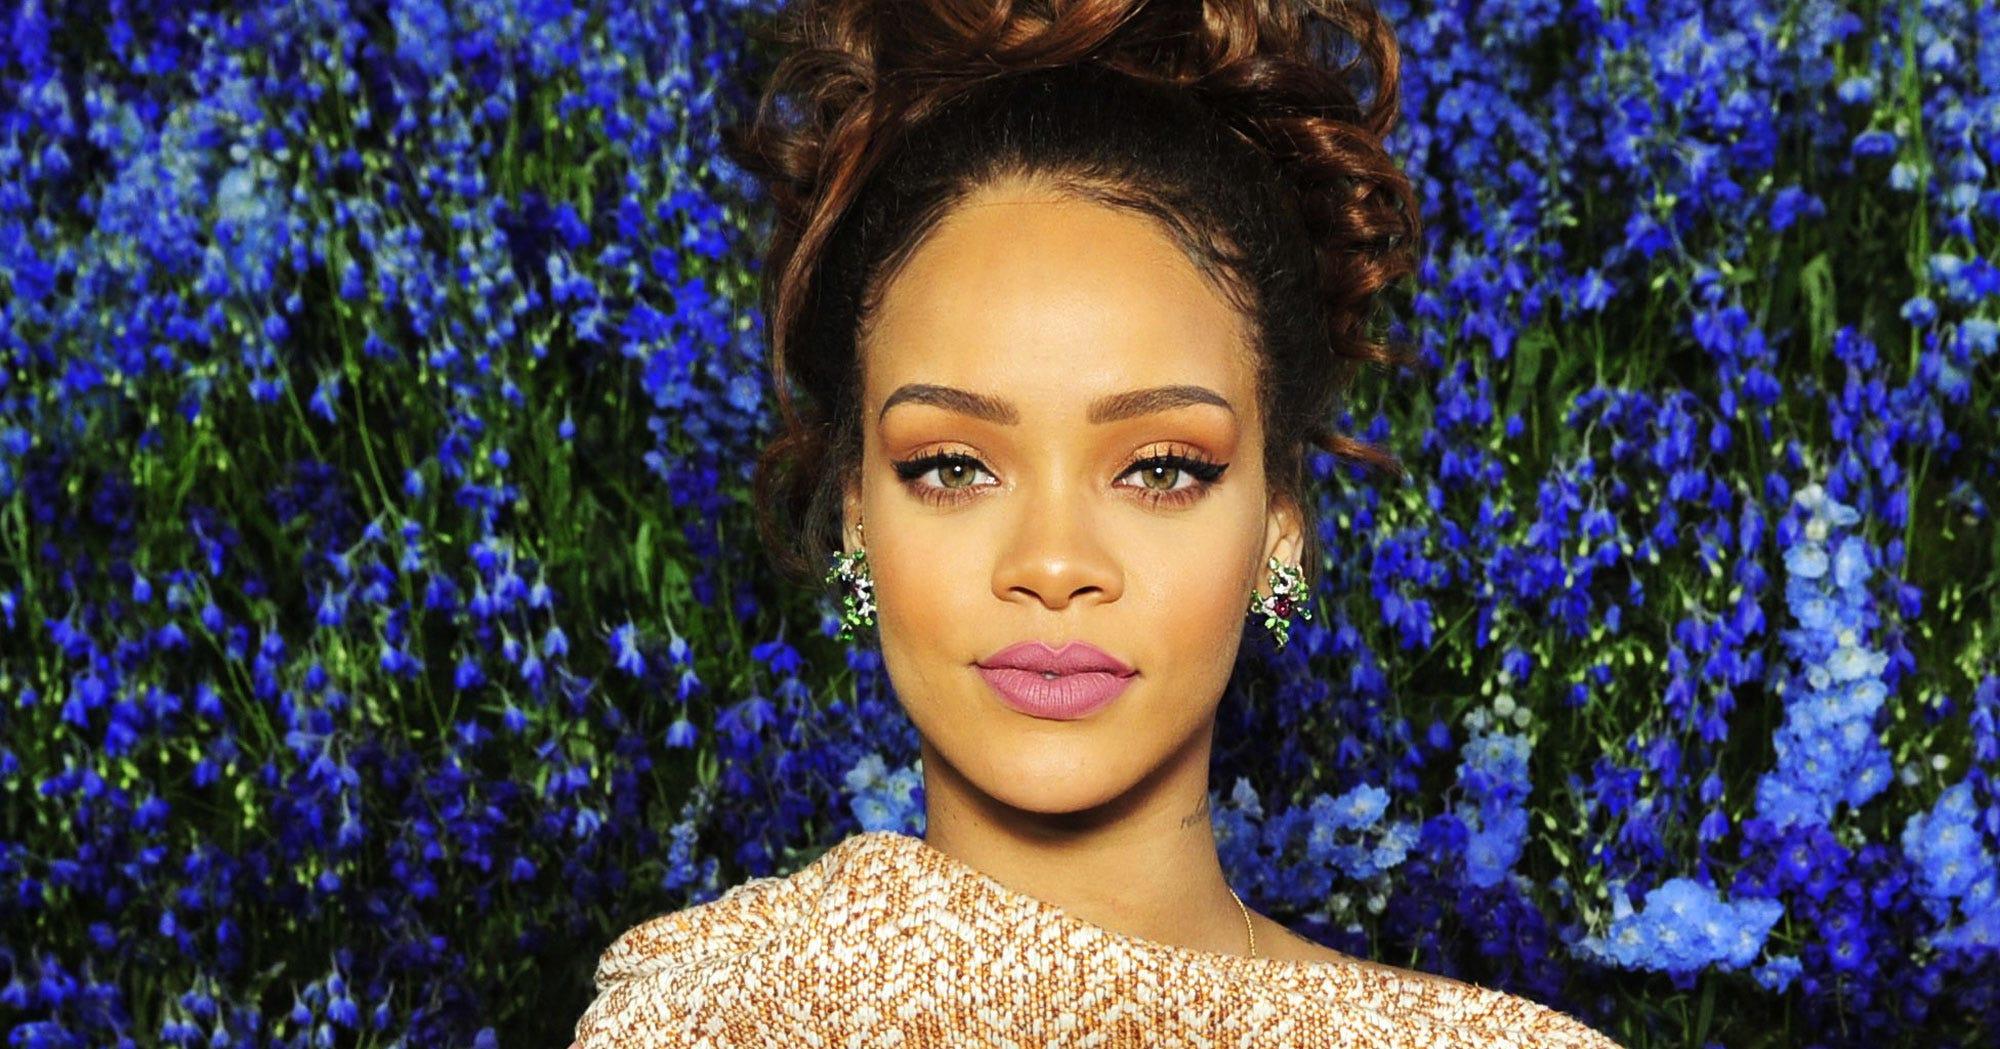 Rihanna Blue Hair We Can Survive Concert